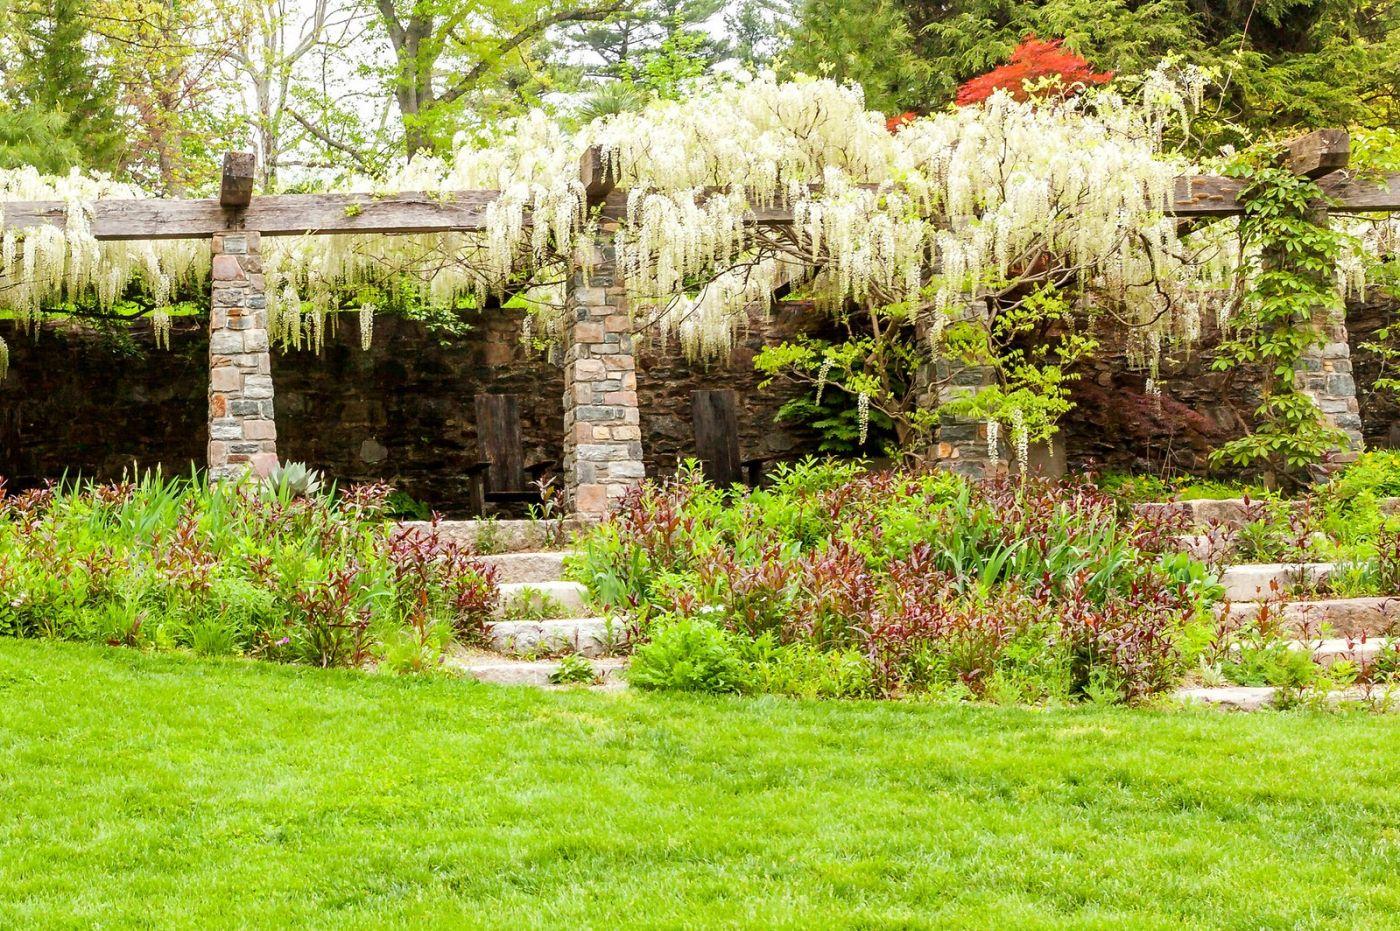 Chanticleer花园,那年盛开的紫藤花_图1-17